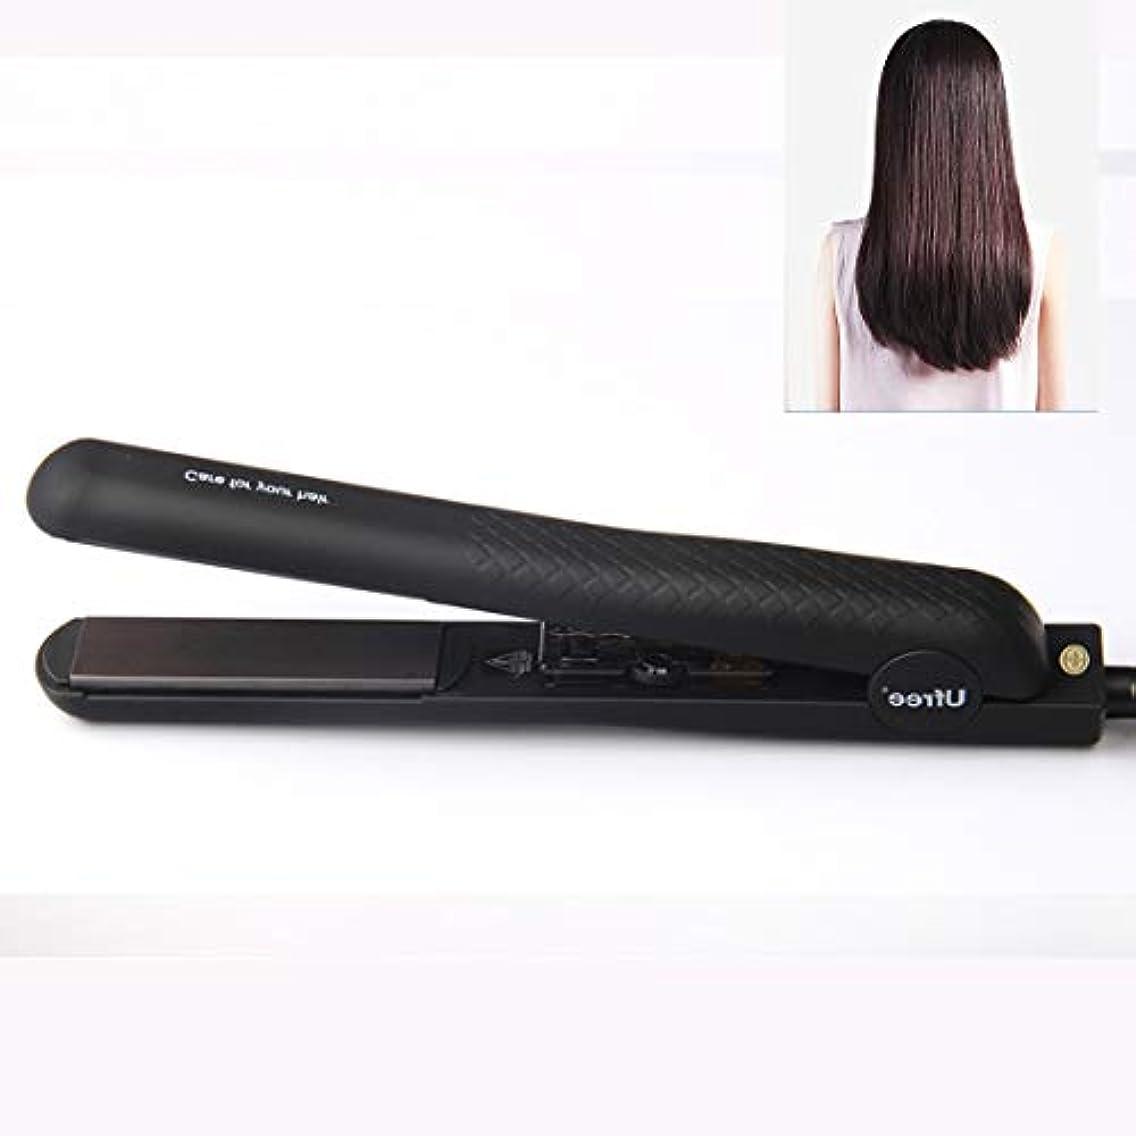 WTYD 美容ヘアツール Ufree U-330セラミックプレート調節可能な温度ストレートヘアアイロン電気合板理髪ツール髪用、EUプラグ(ブラック) (色 : Black)